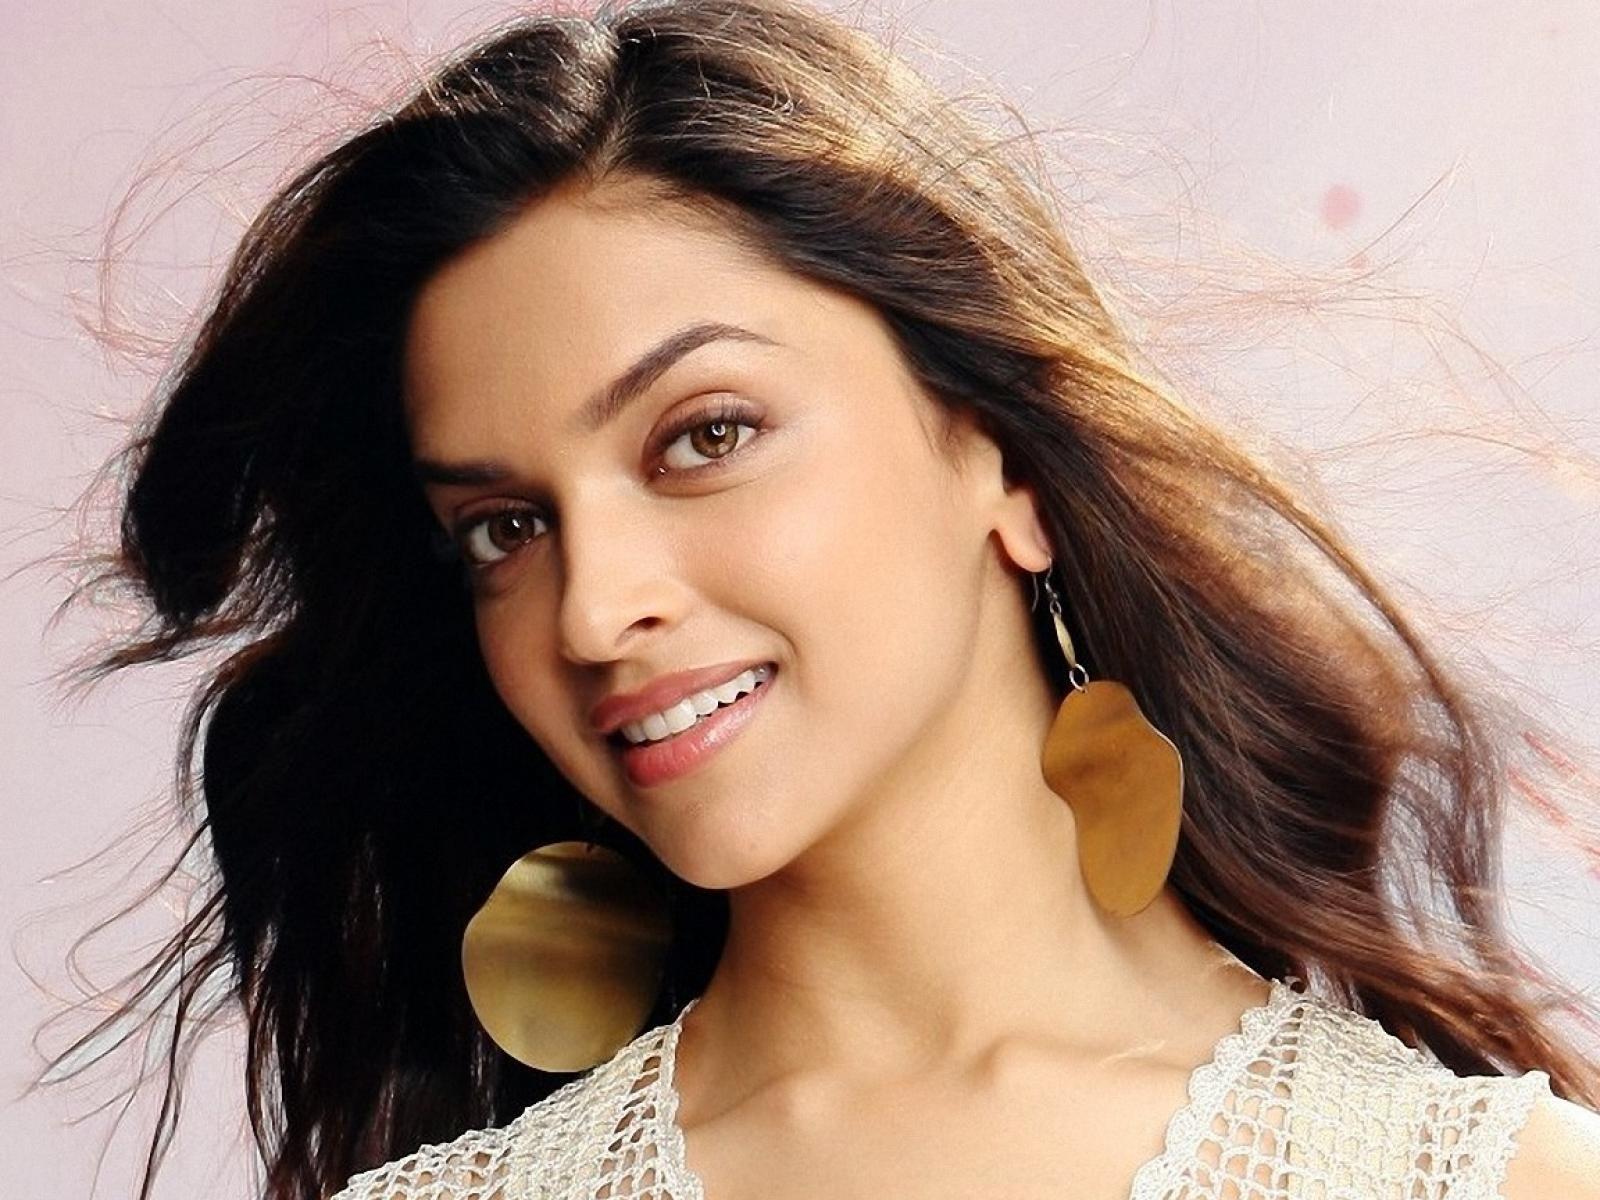 Deepika Padukone Smile Wallpaper High Quality Resolution Most Beautiful Bollywood Actress Beautiful Bollywood Actress Deepika Padukone Wallpaper